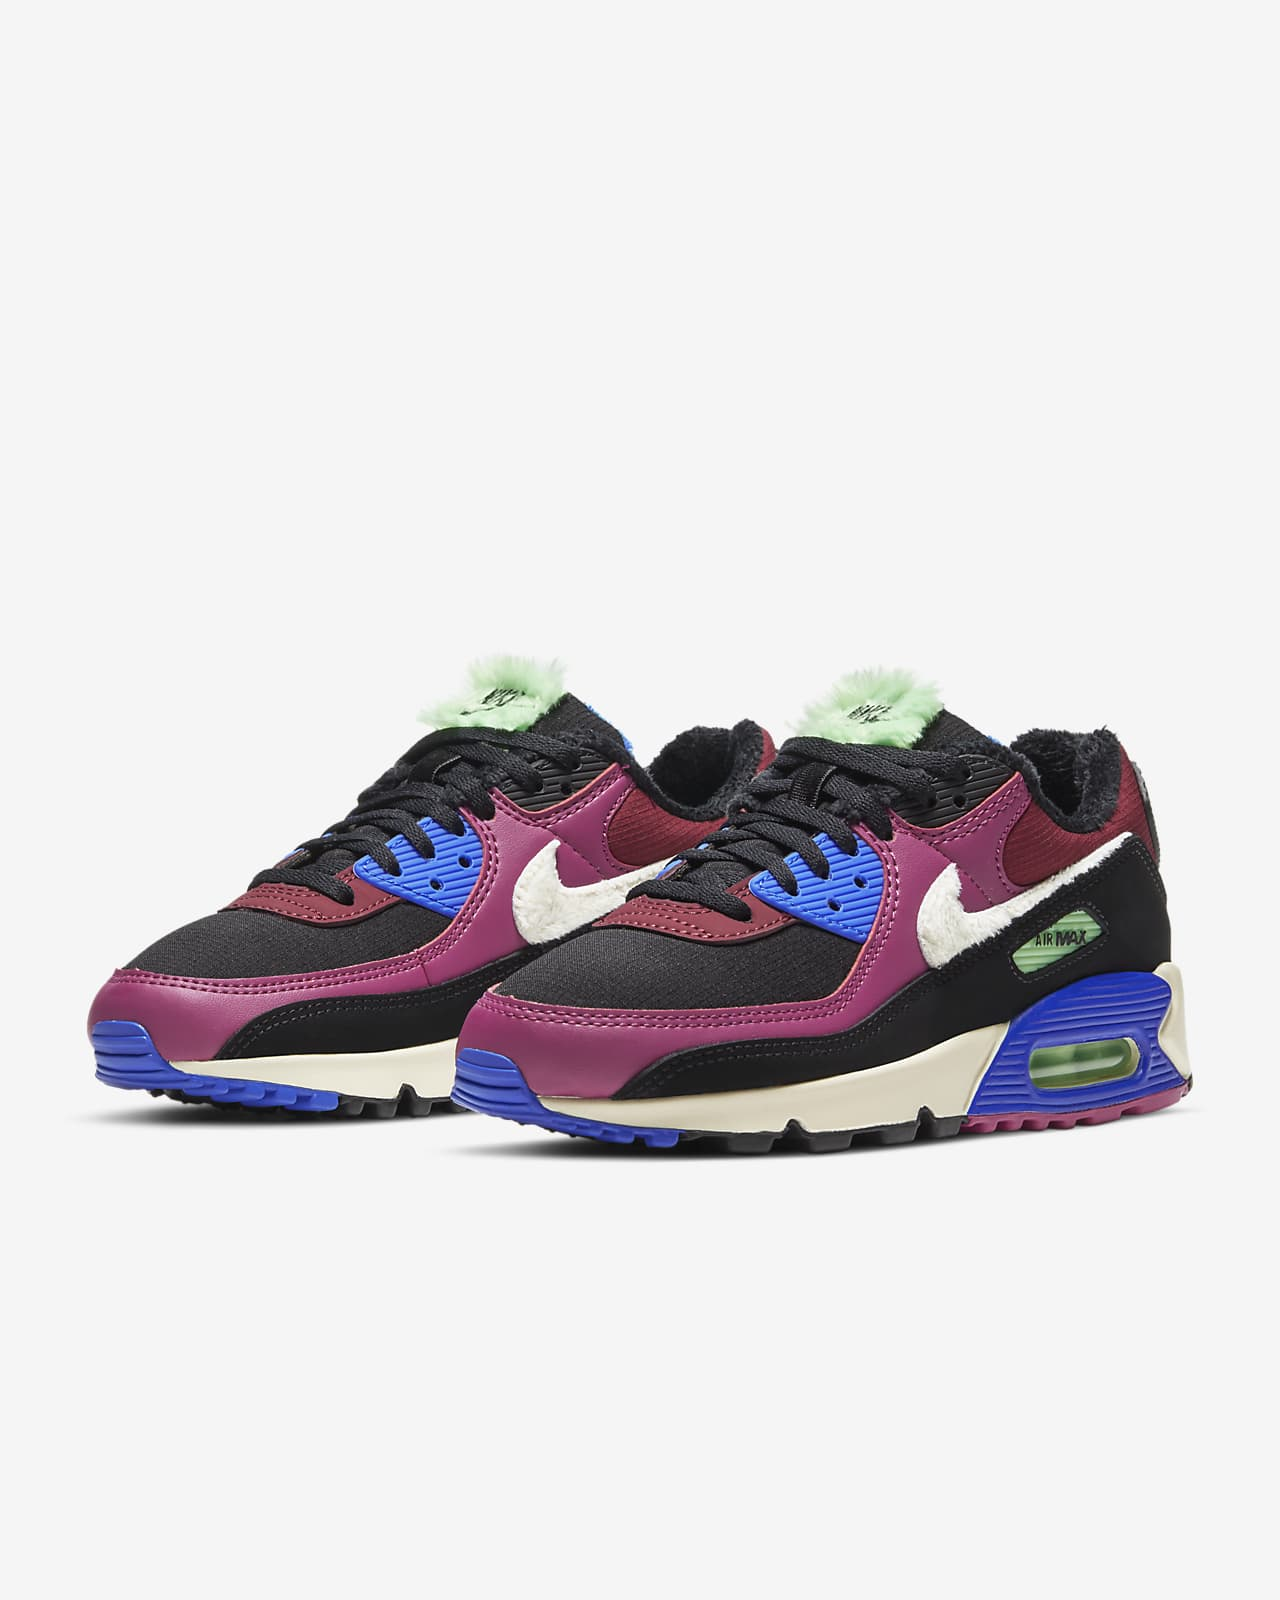 nike air max 90 size 8 purple